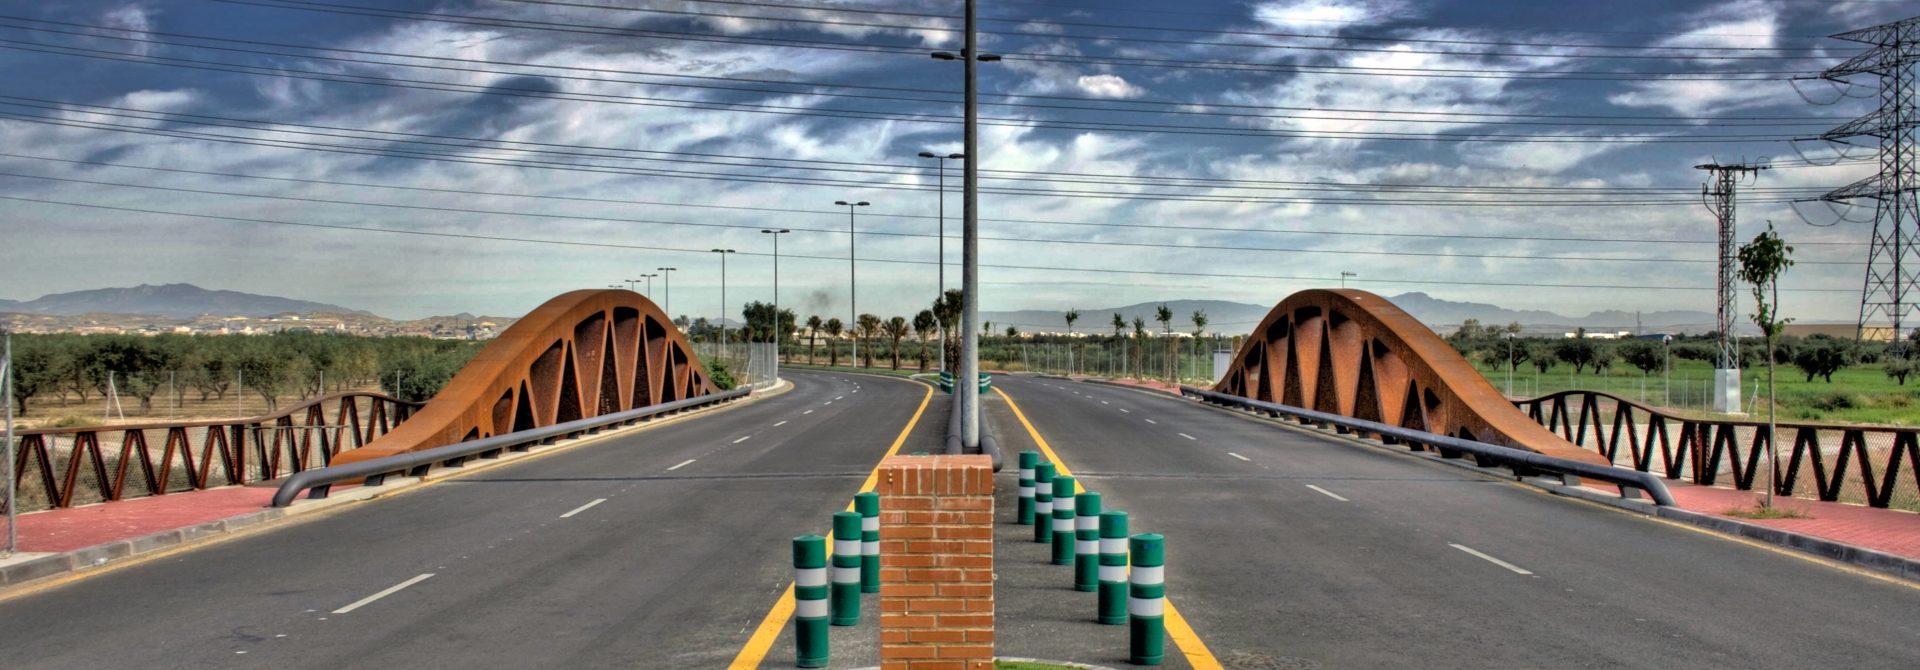 puente angular hdr-1